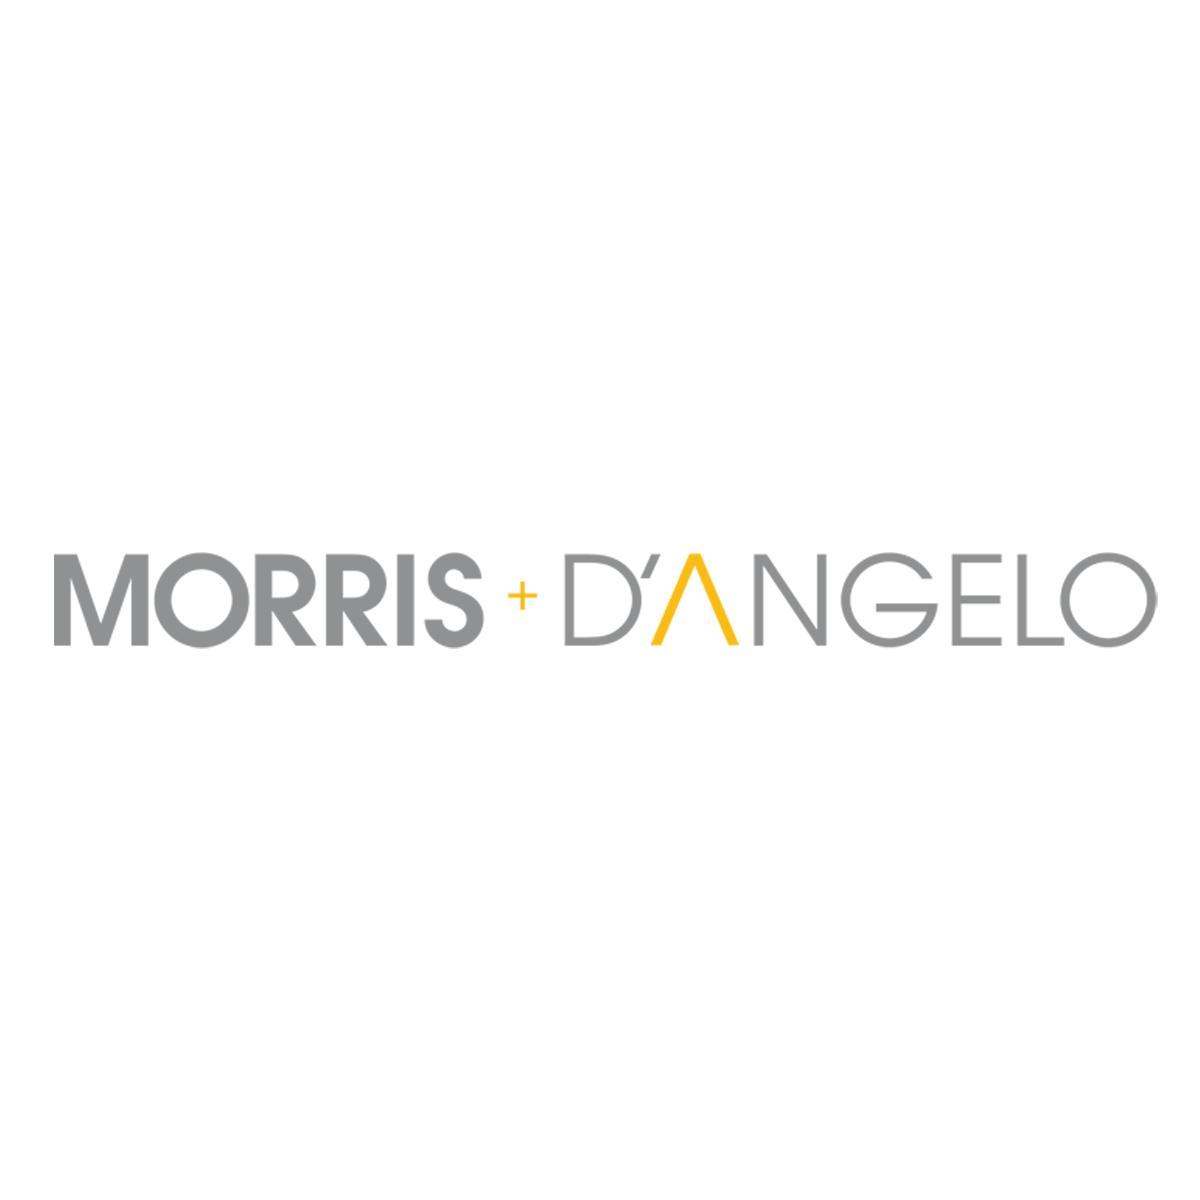 Morris+D'Angelo, Morris D'Angelo, Morris Dangelo, CPA,